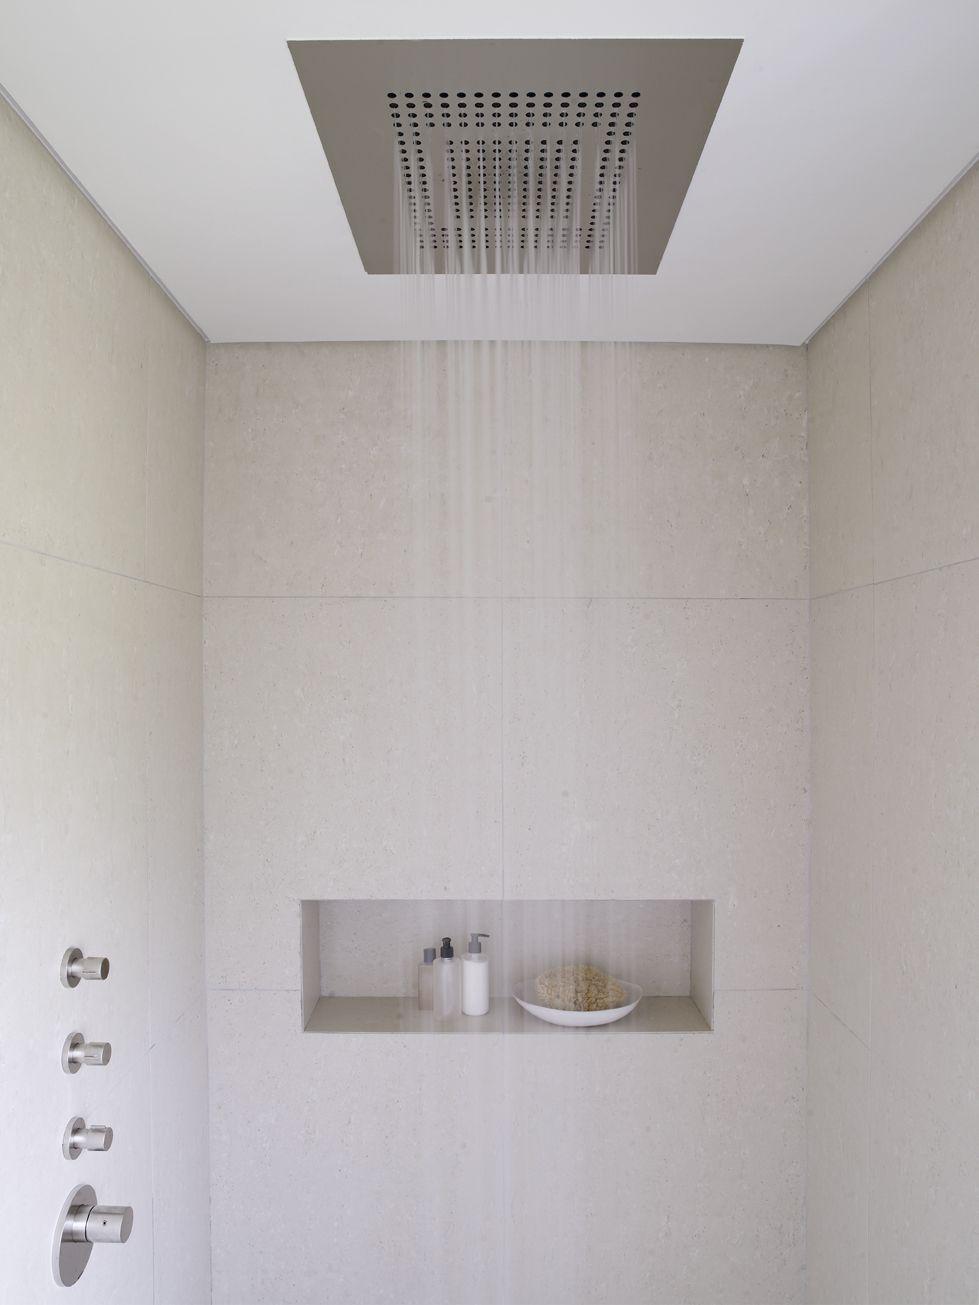 Piet Boon Styling by Karin Meyn | South Africa - shower design ...